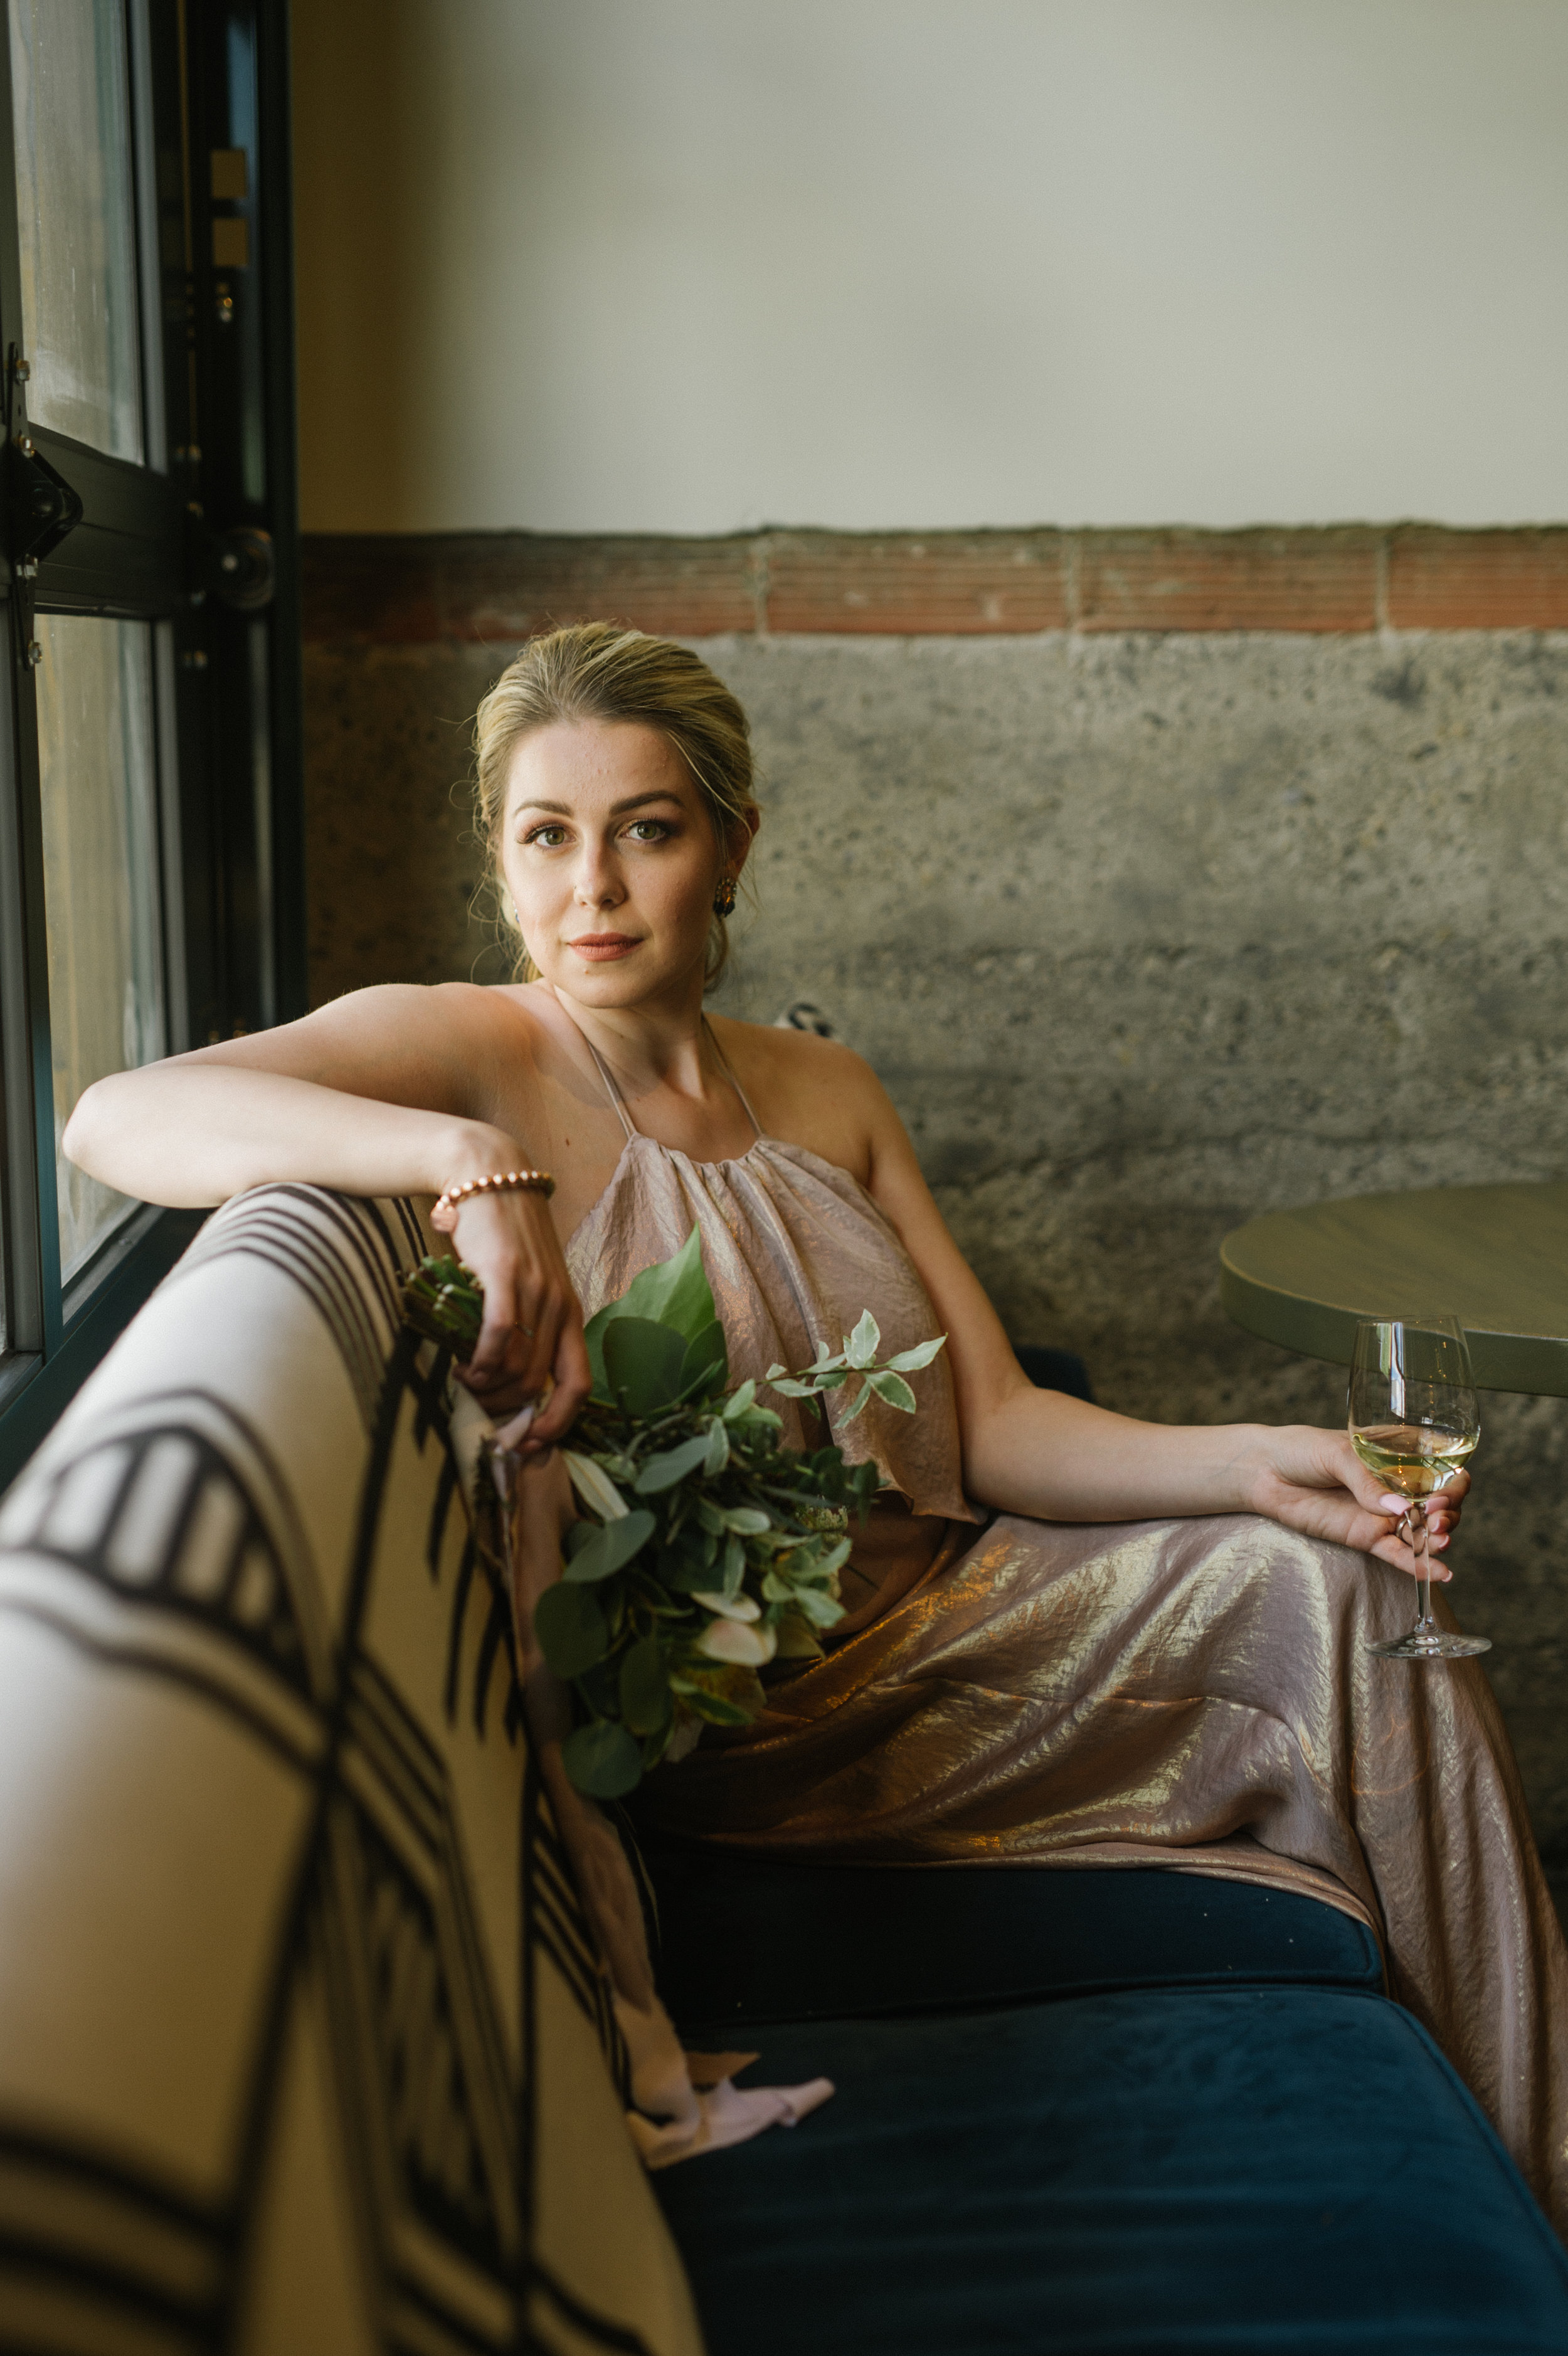 Calgary_Wedding_Photography_Bridgette_Bar_Bridesmaids_Shoot_2018_HR069.jpg